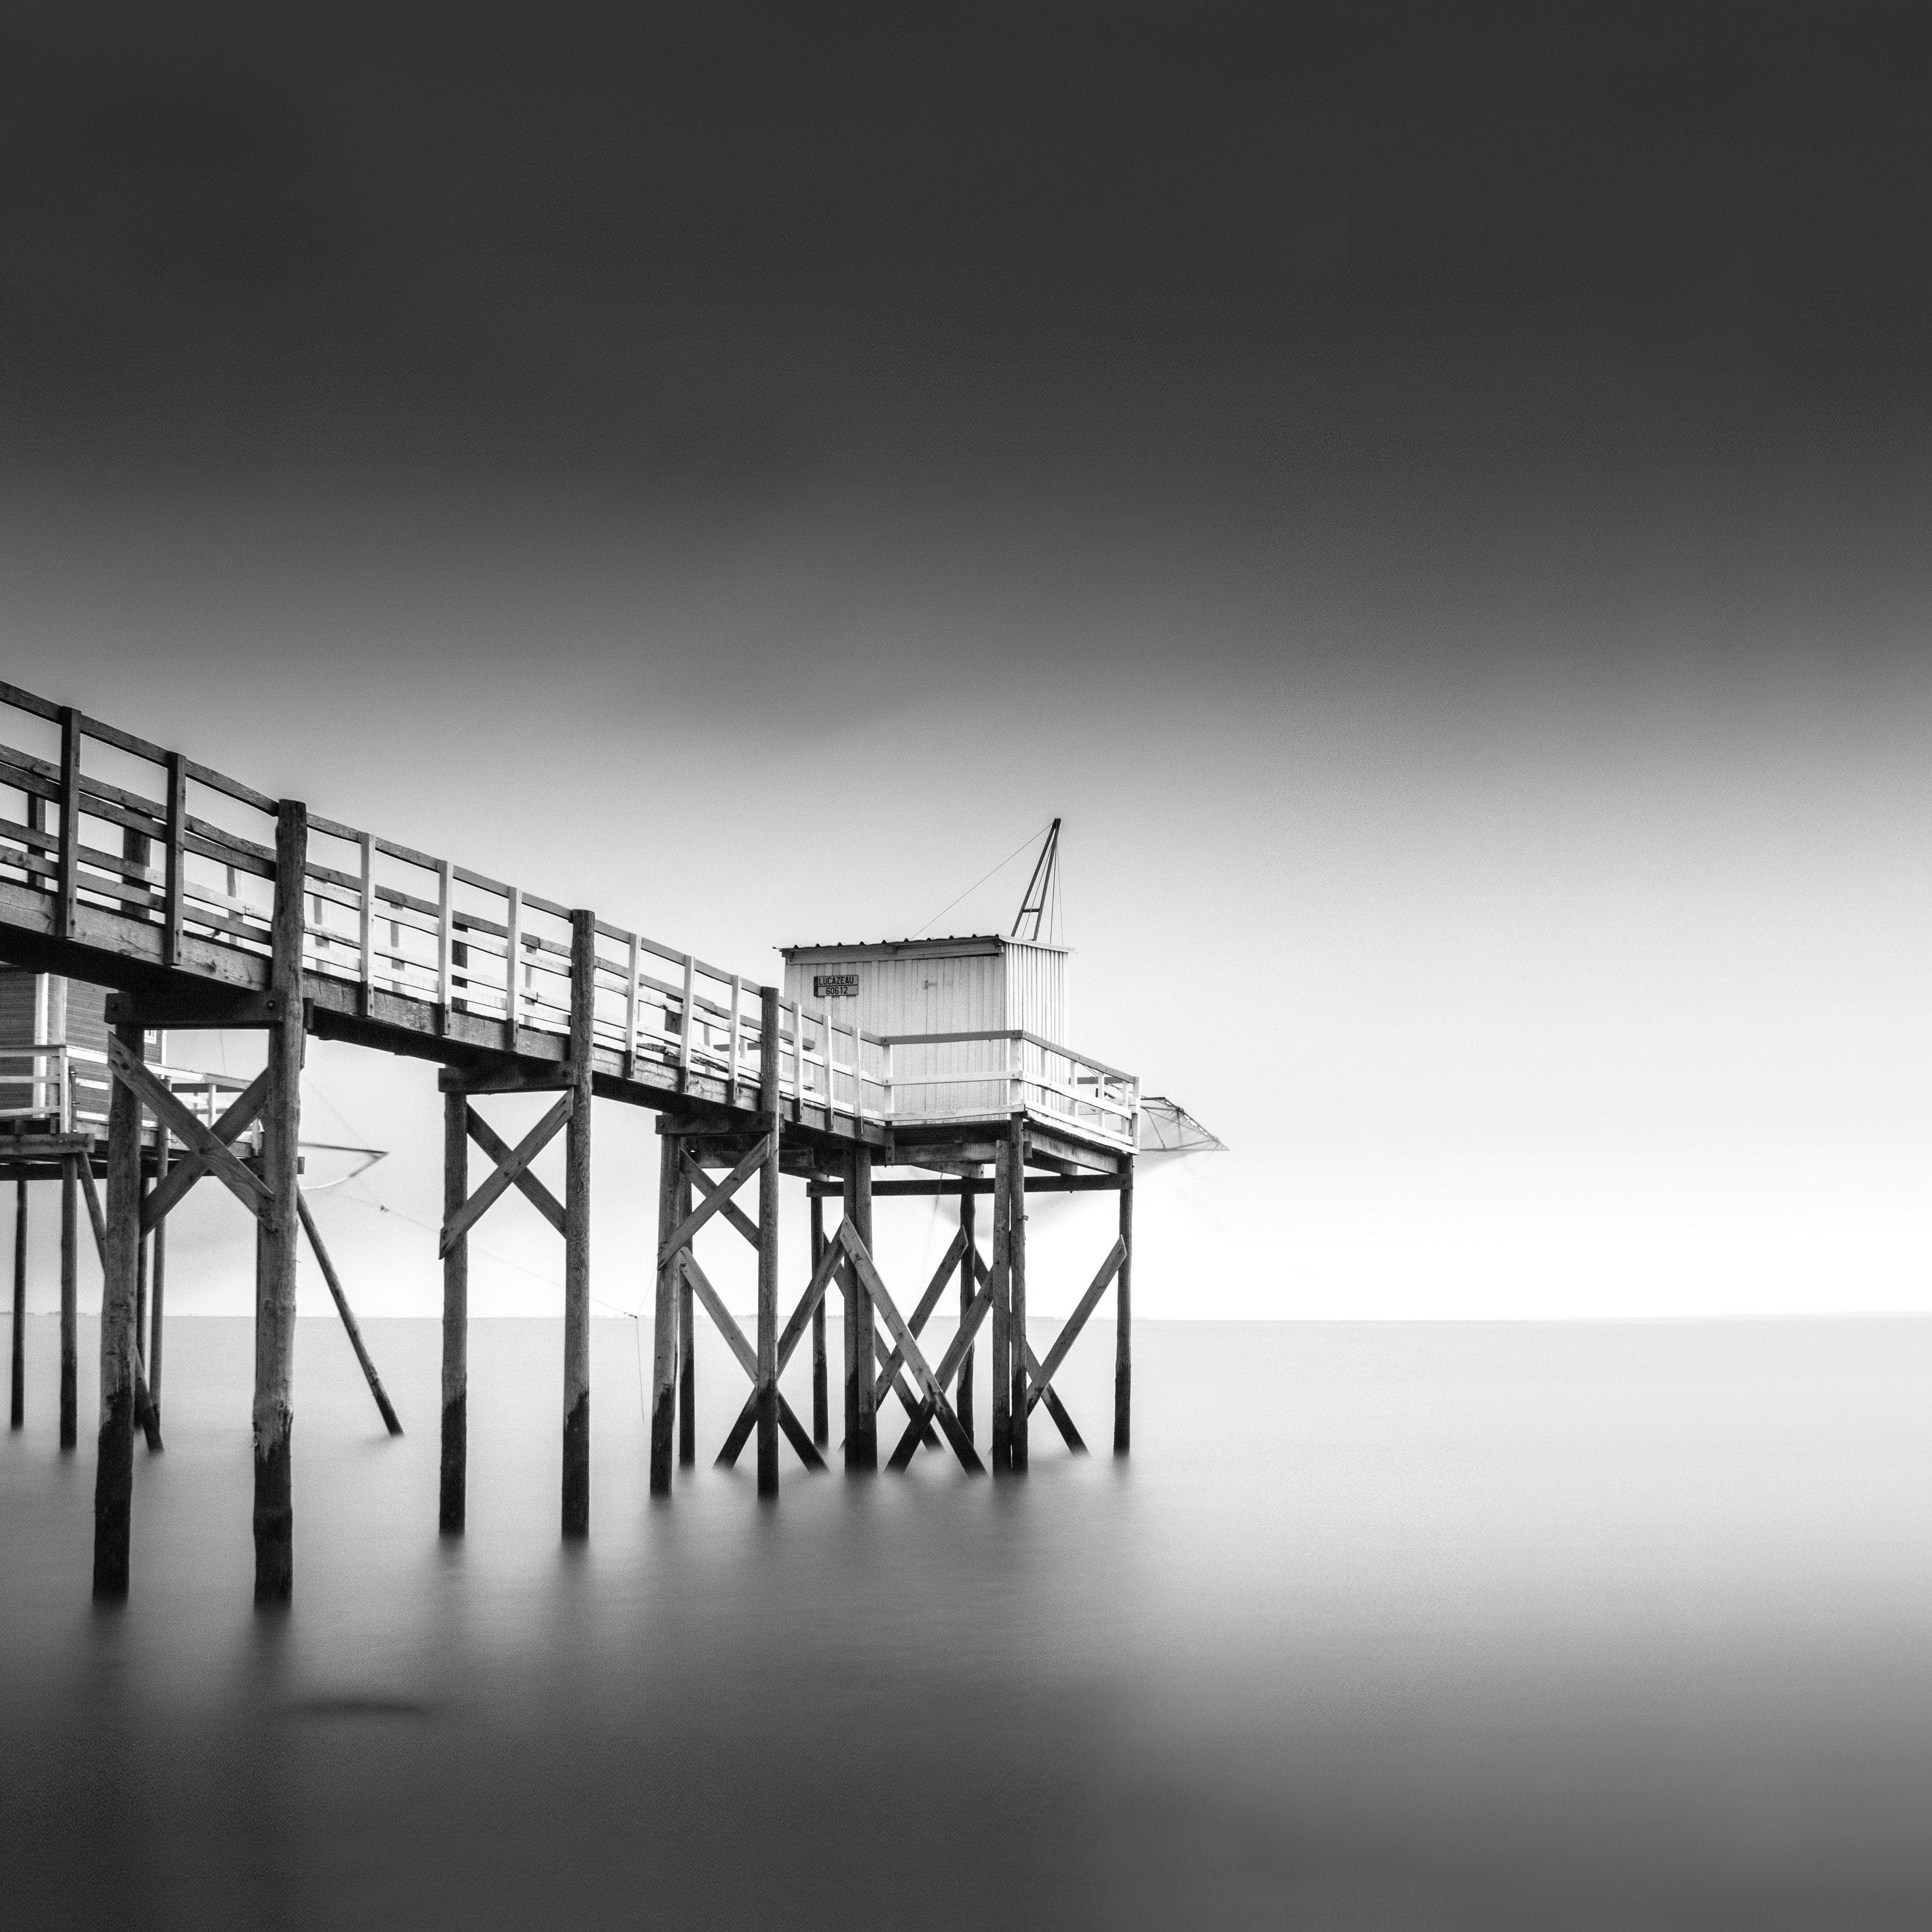 Fishing pier long exposure